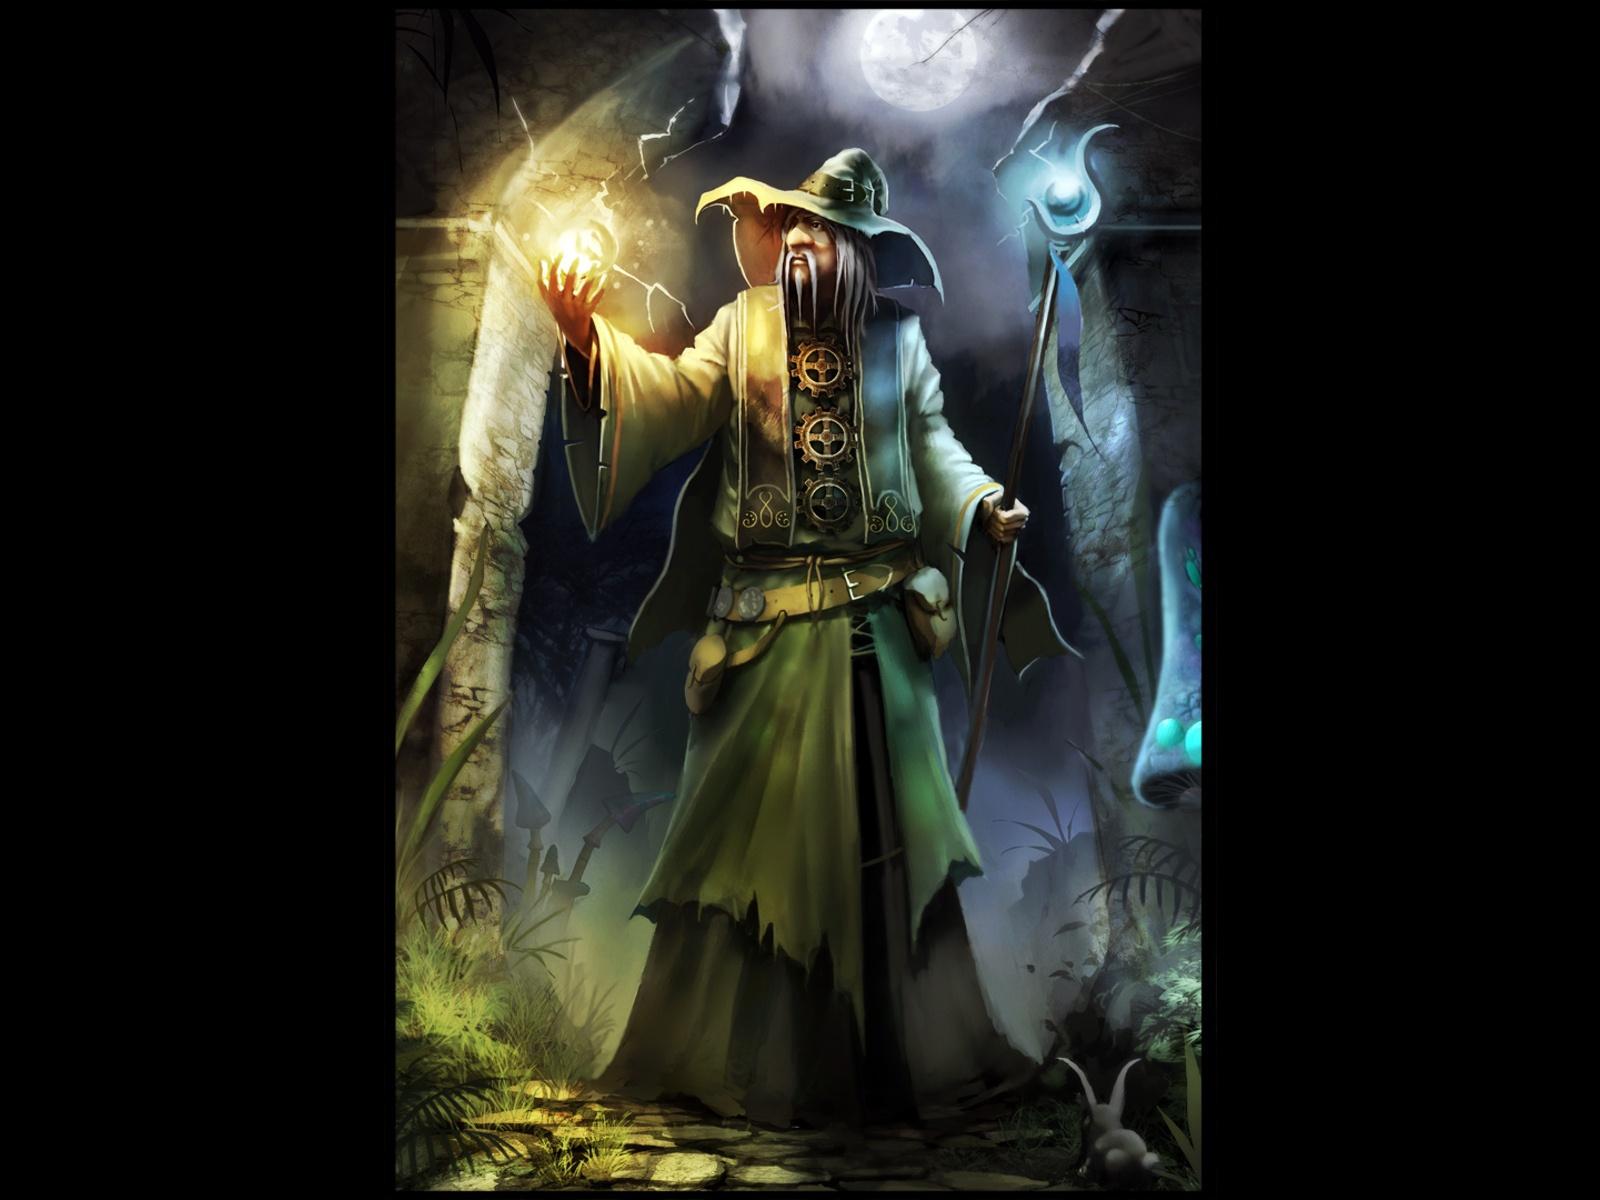 Fantasy Wizard Background 1 Hd Wallpapers: Wizard Desktop Wallpaper